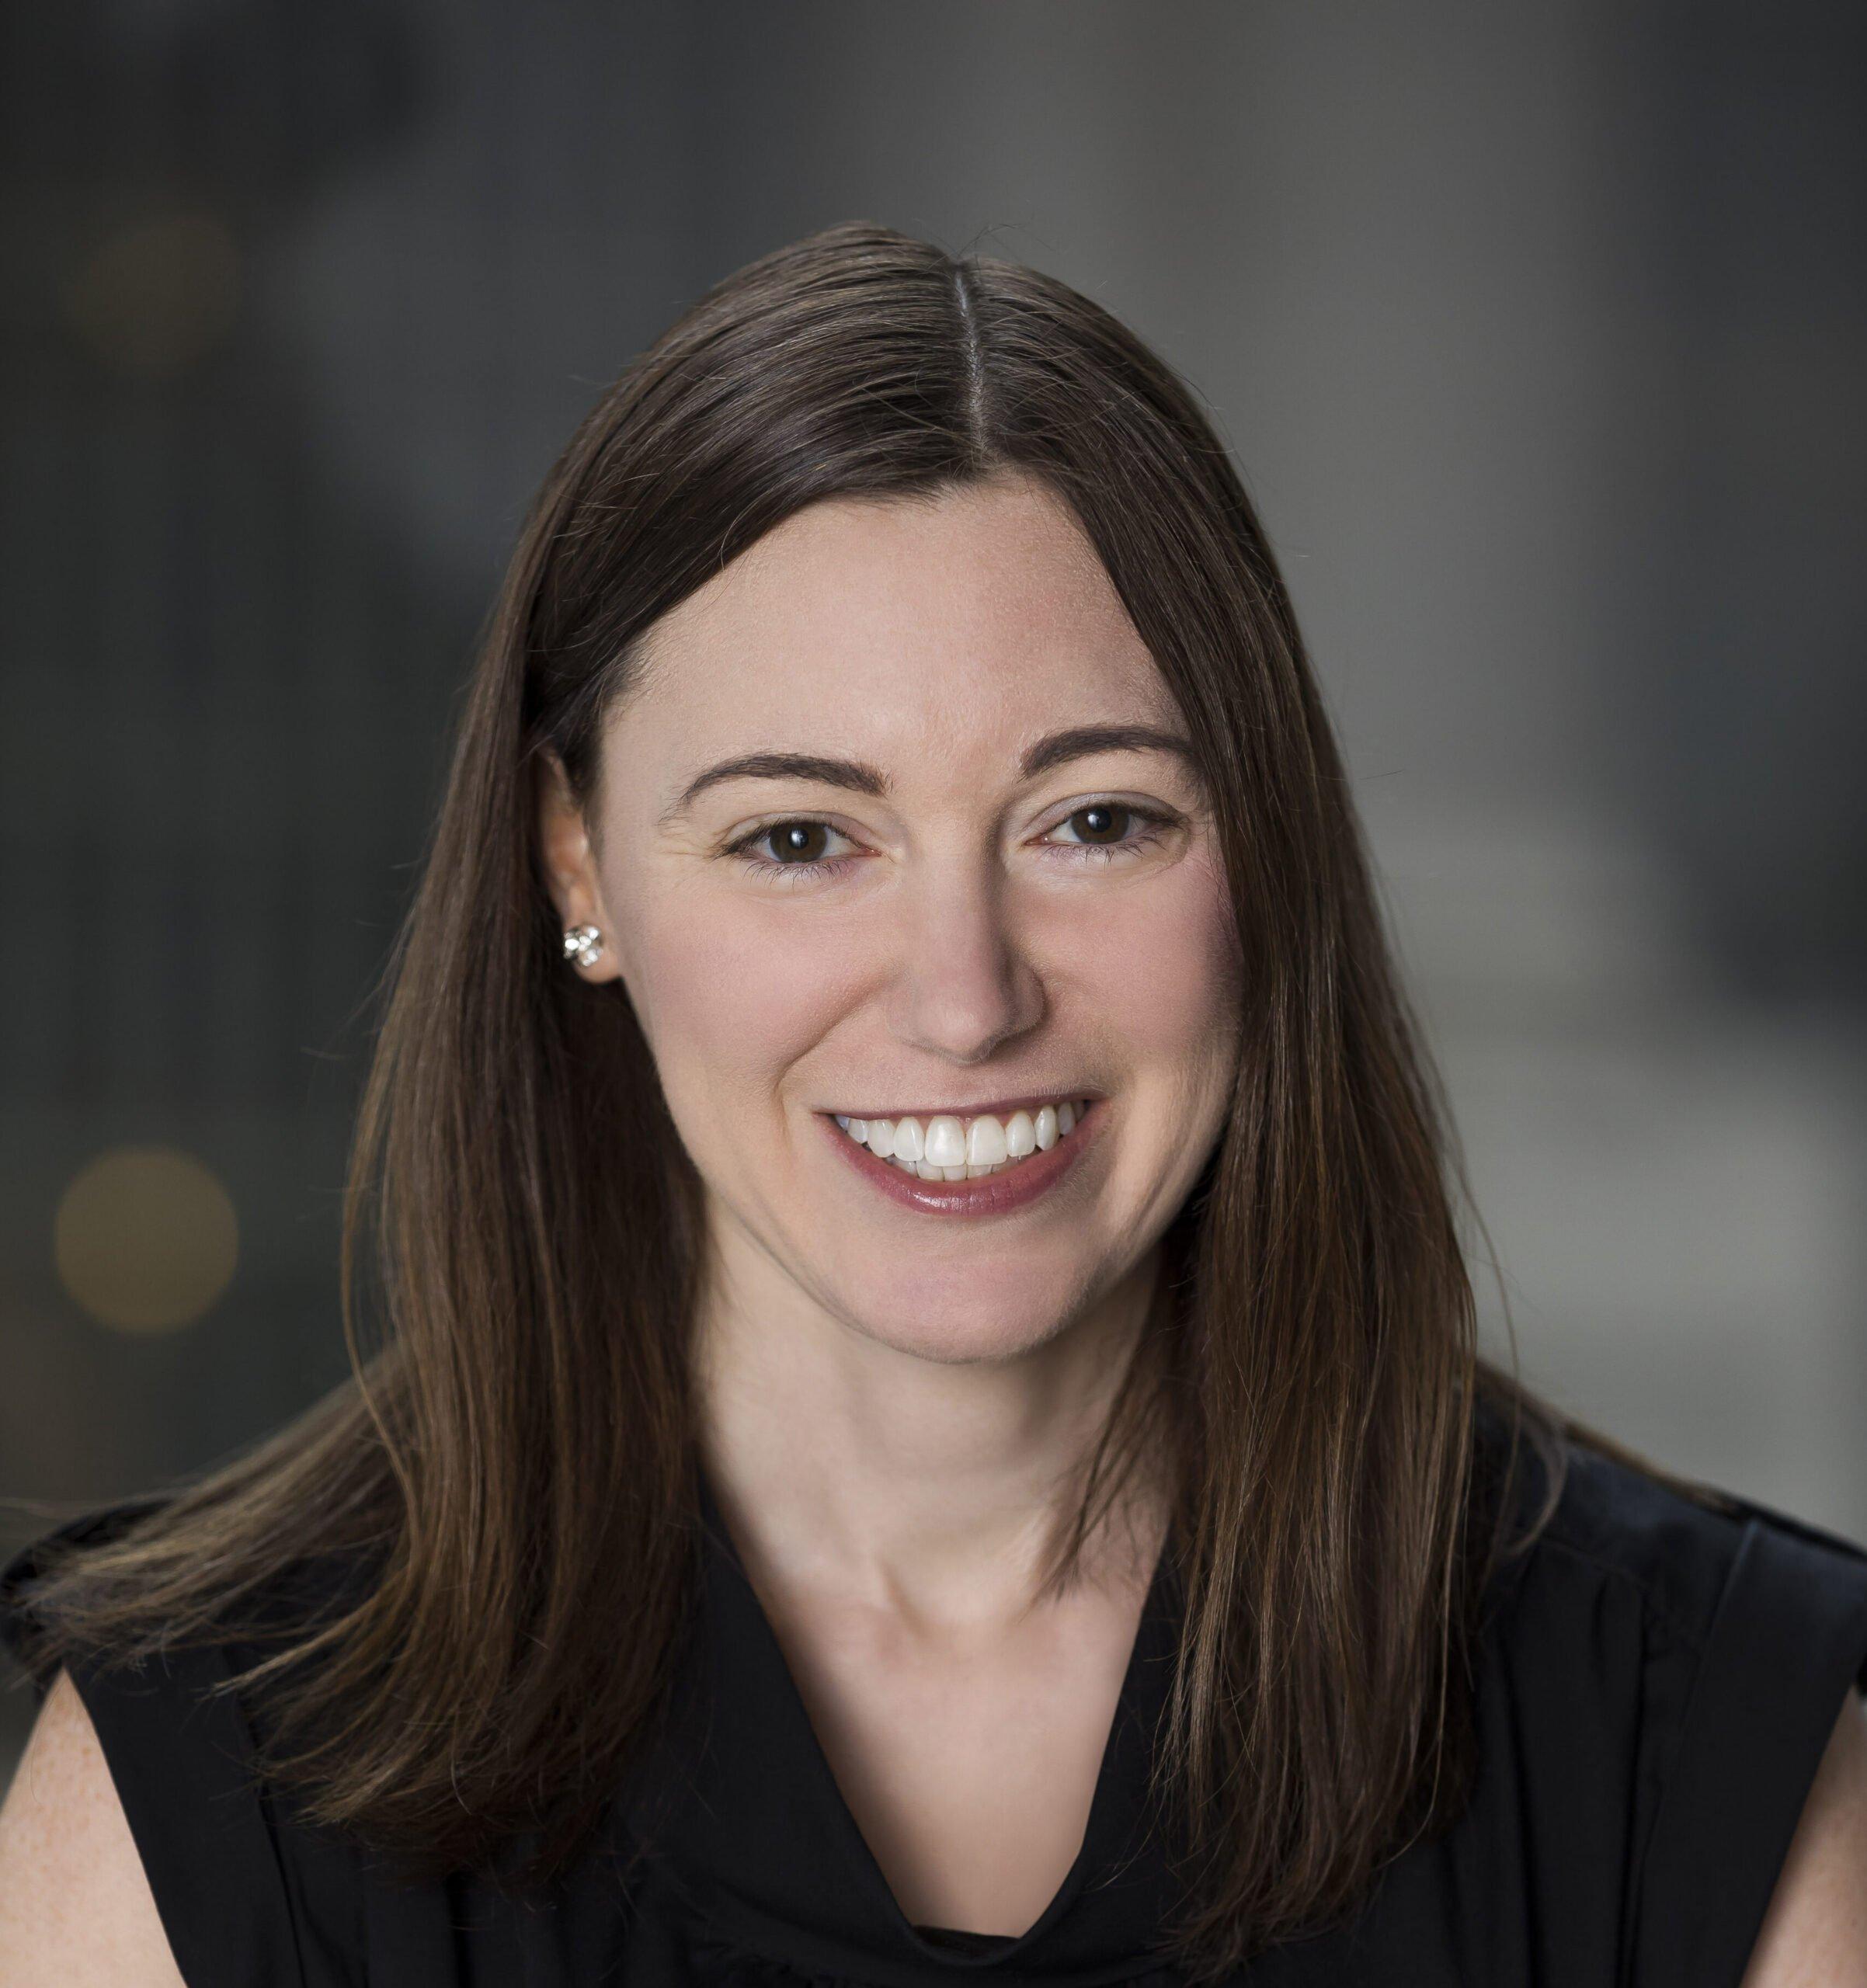 Kate Eberle Walker,Chief Executive Officerof PresenceLearning